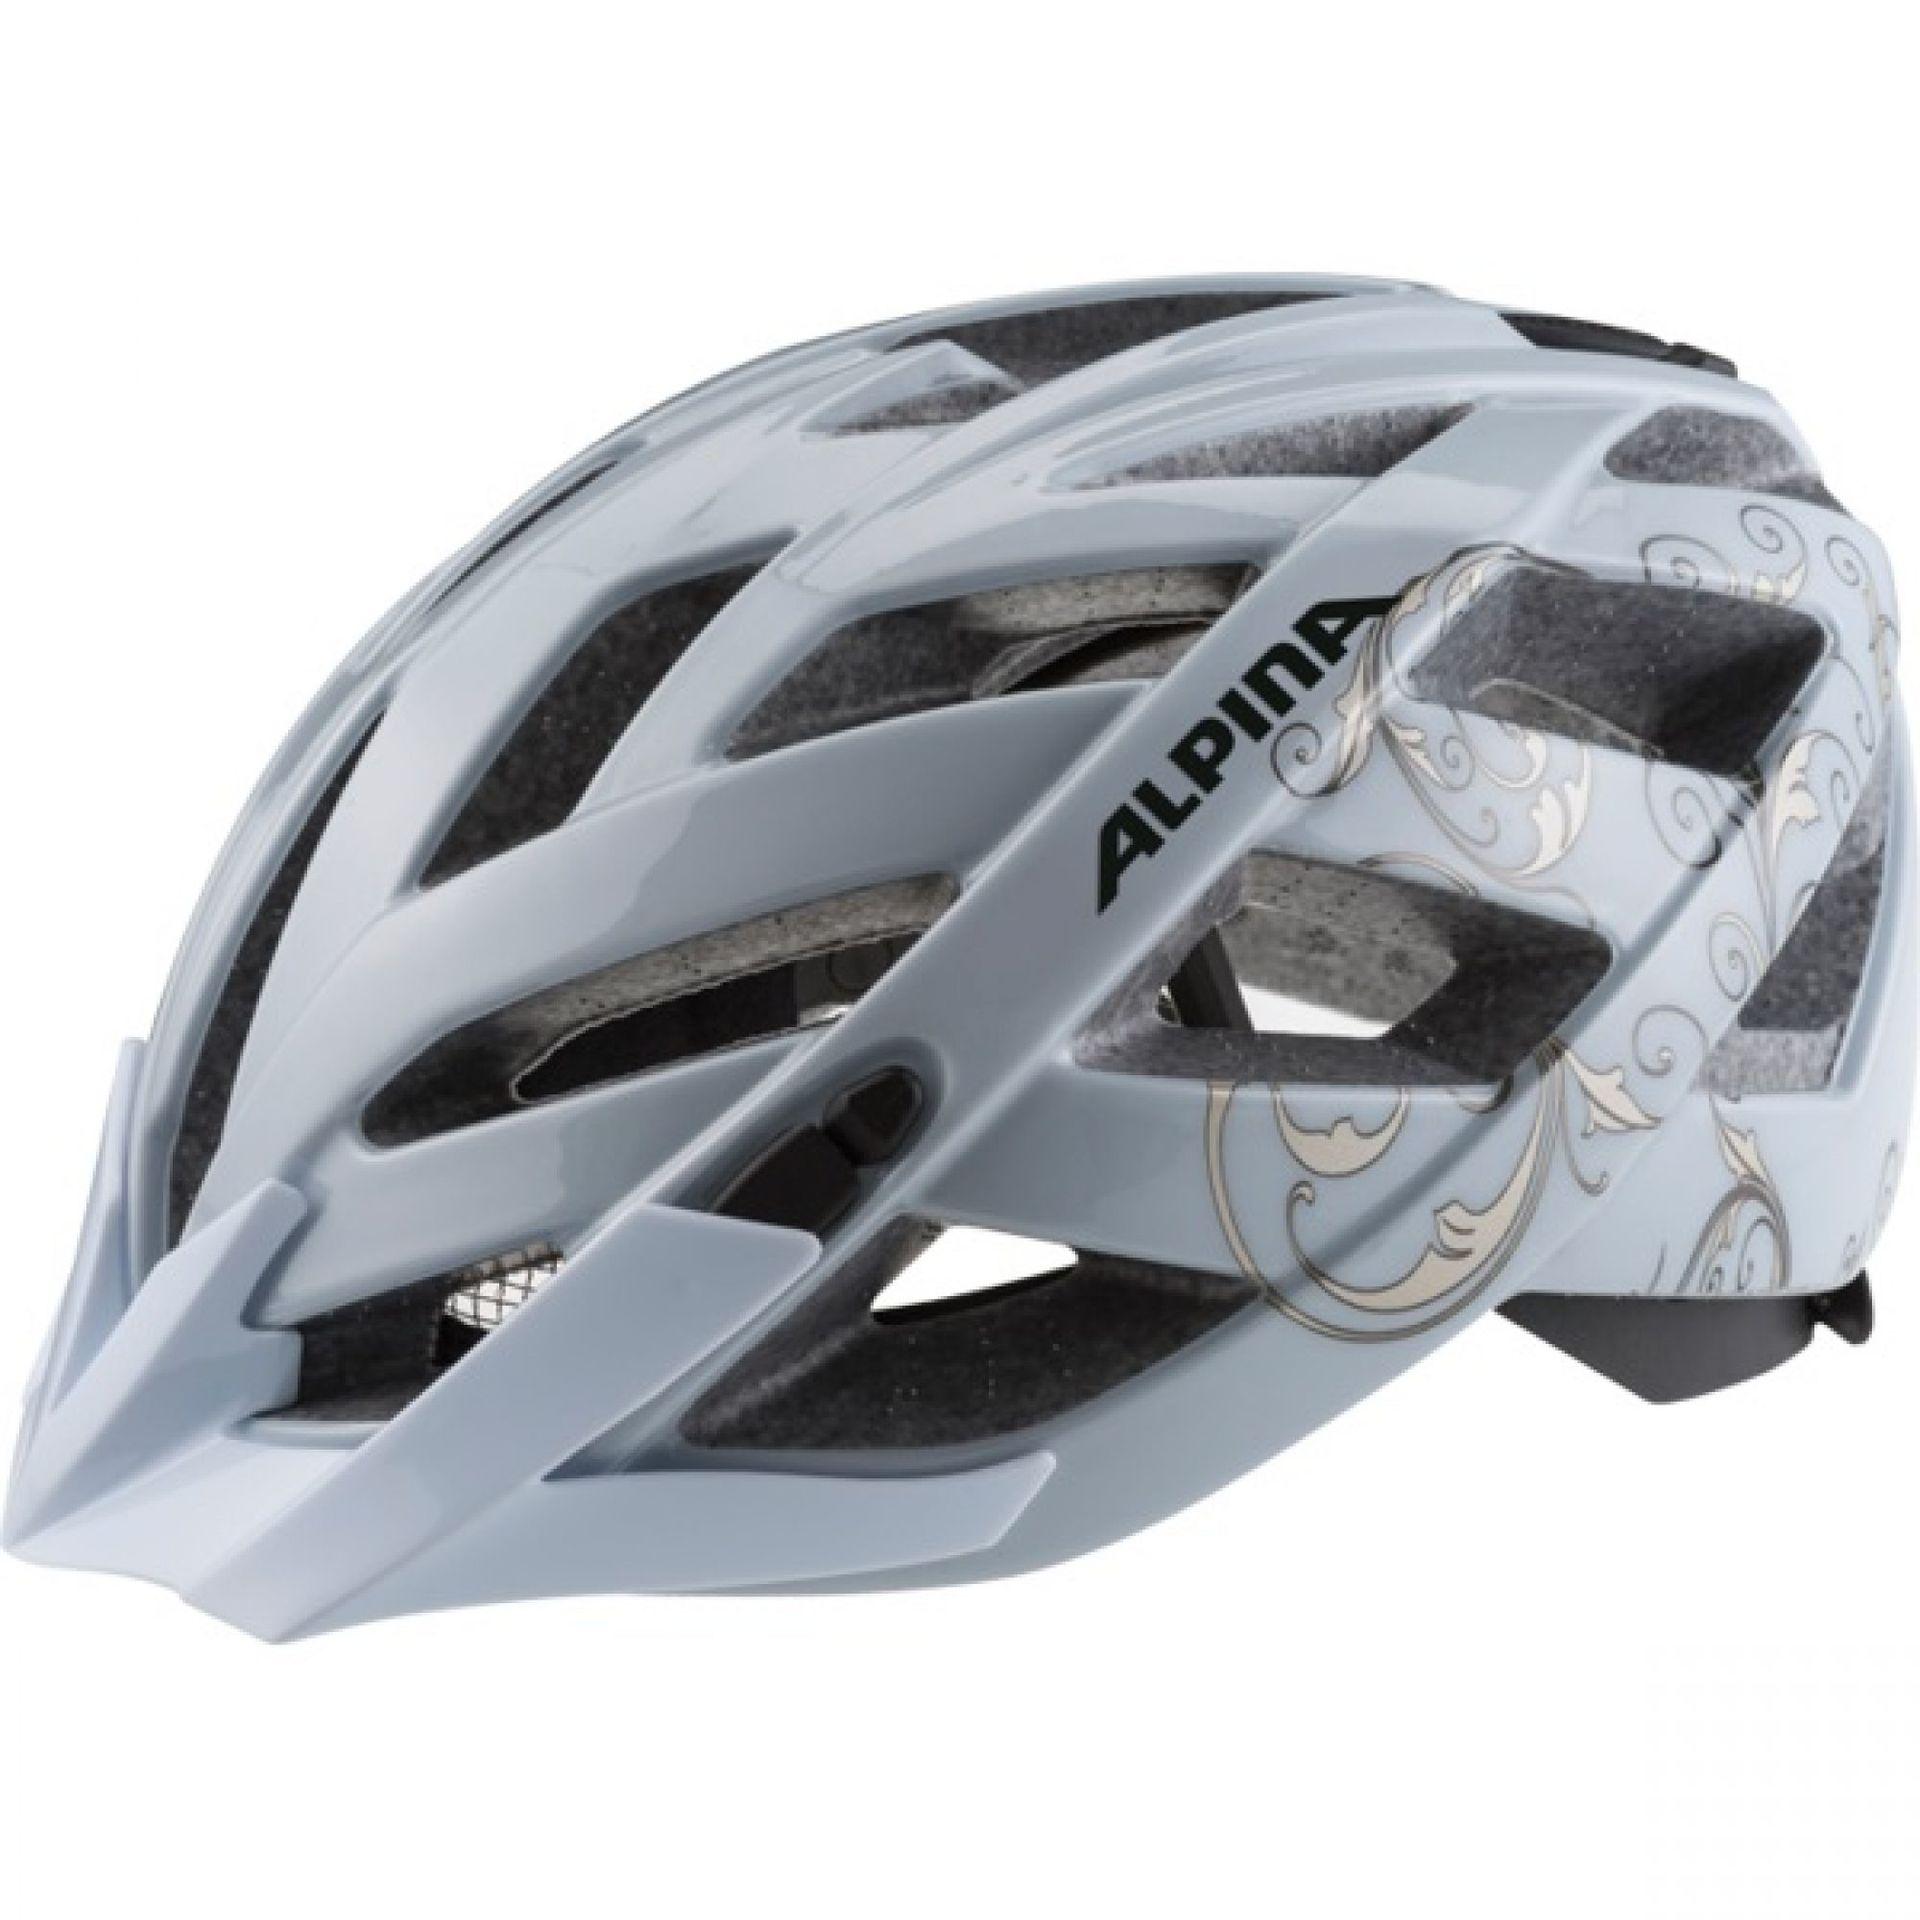 Kask rowerowy Alpina Panoma szary